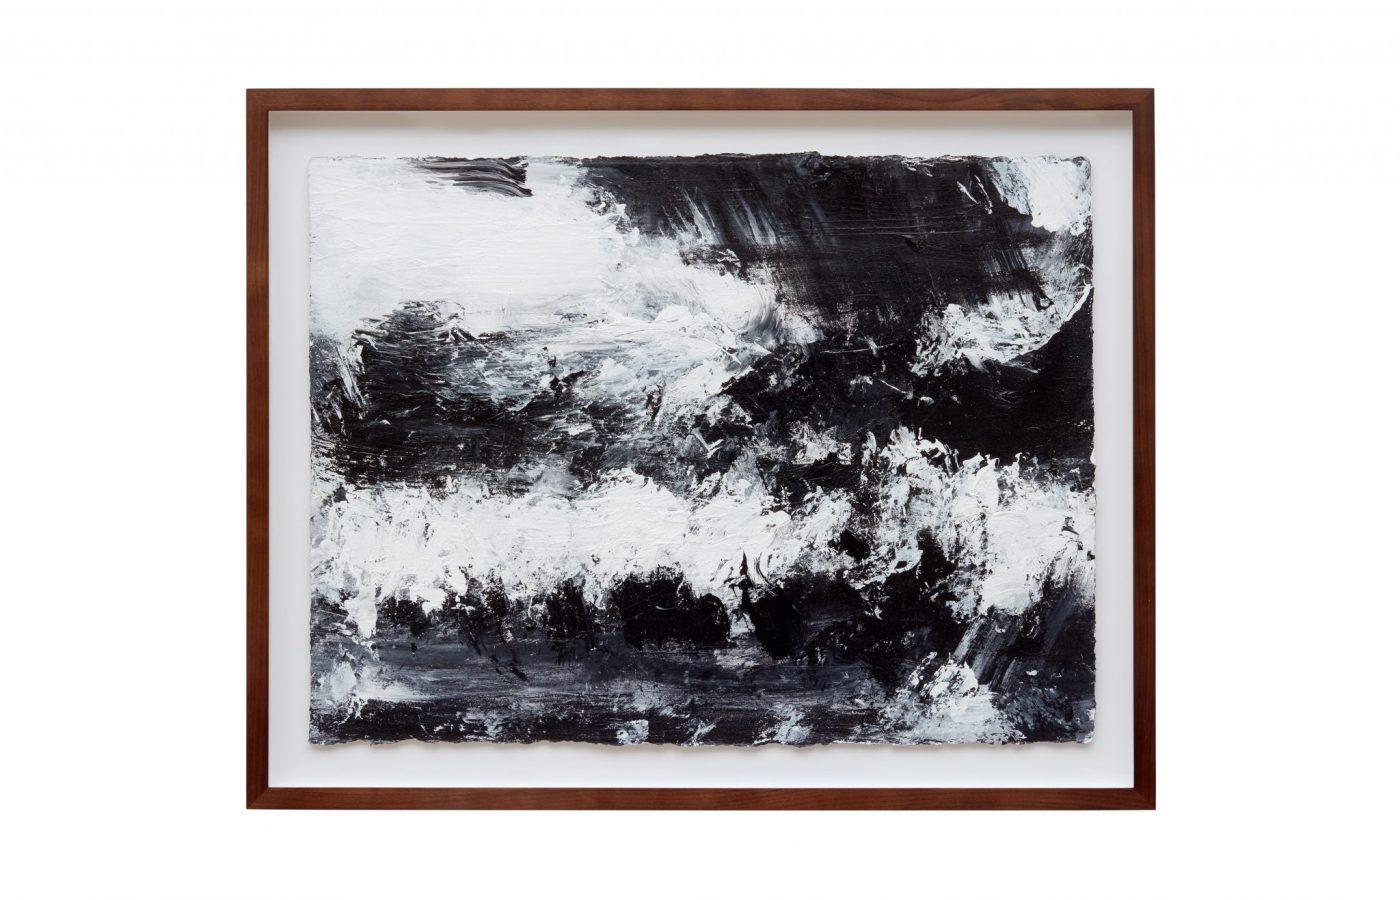 FXF18-30 John Virtue Untitled No 36 2014